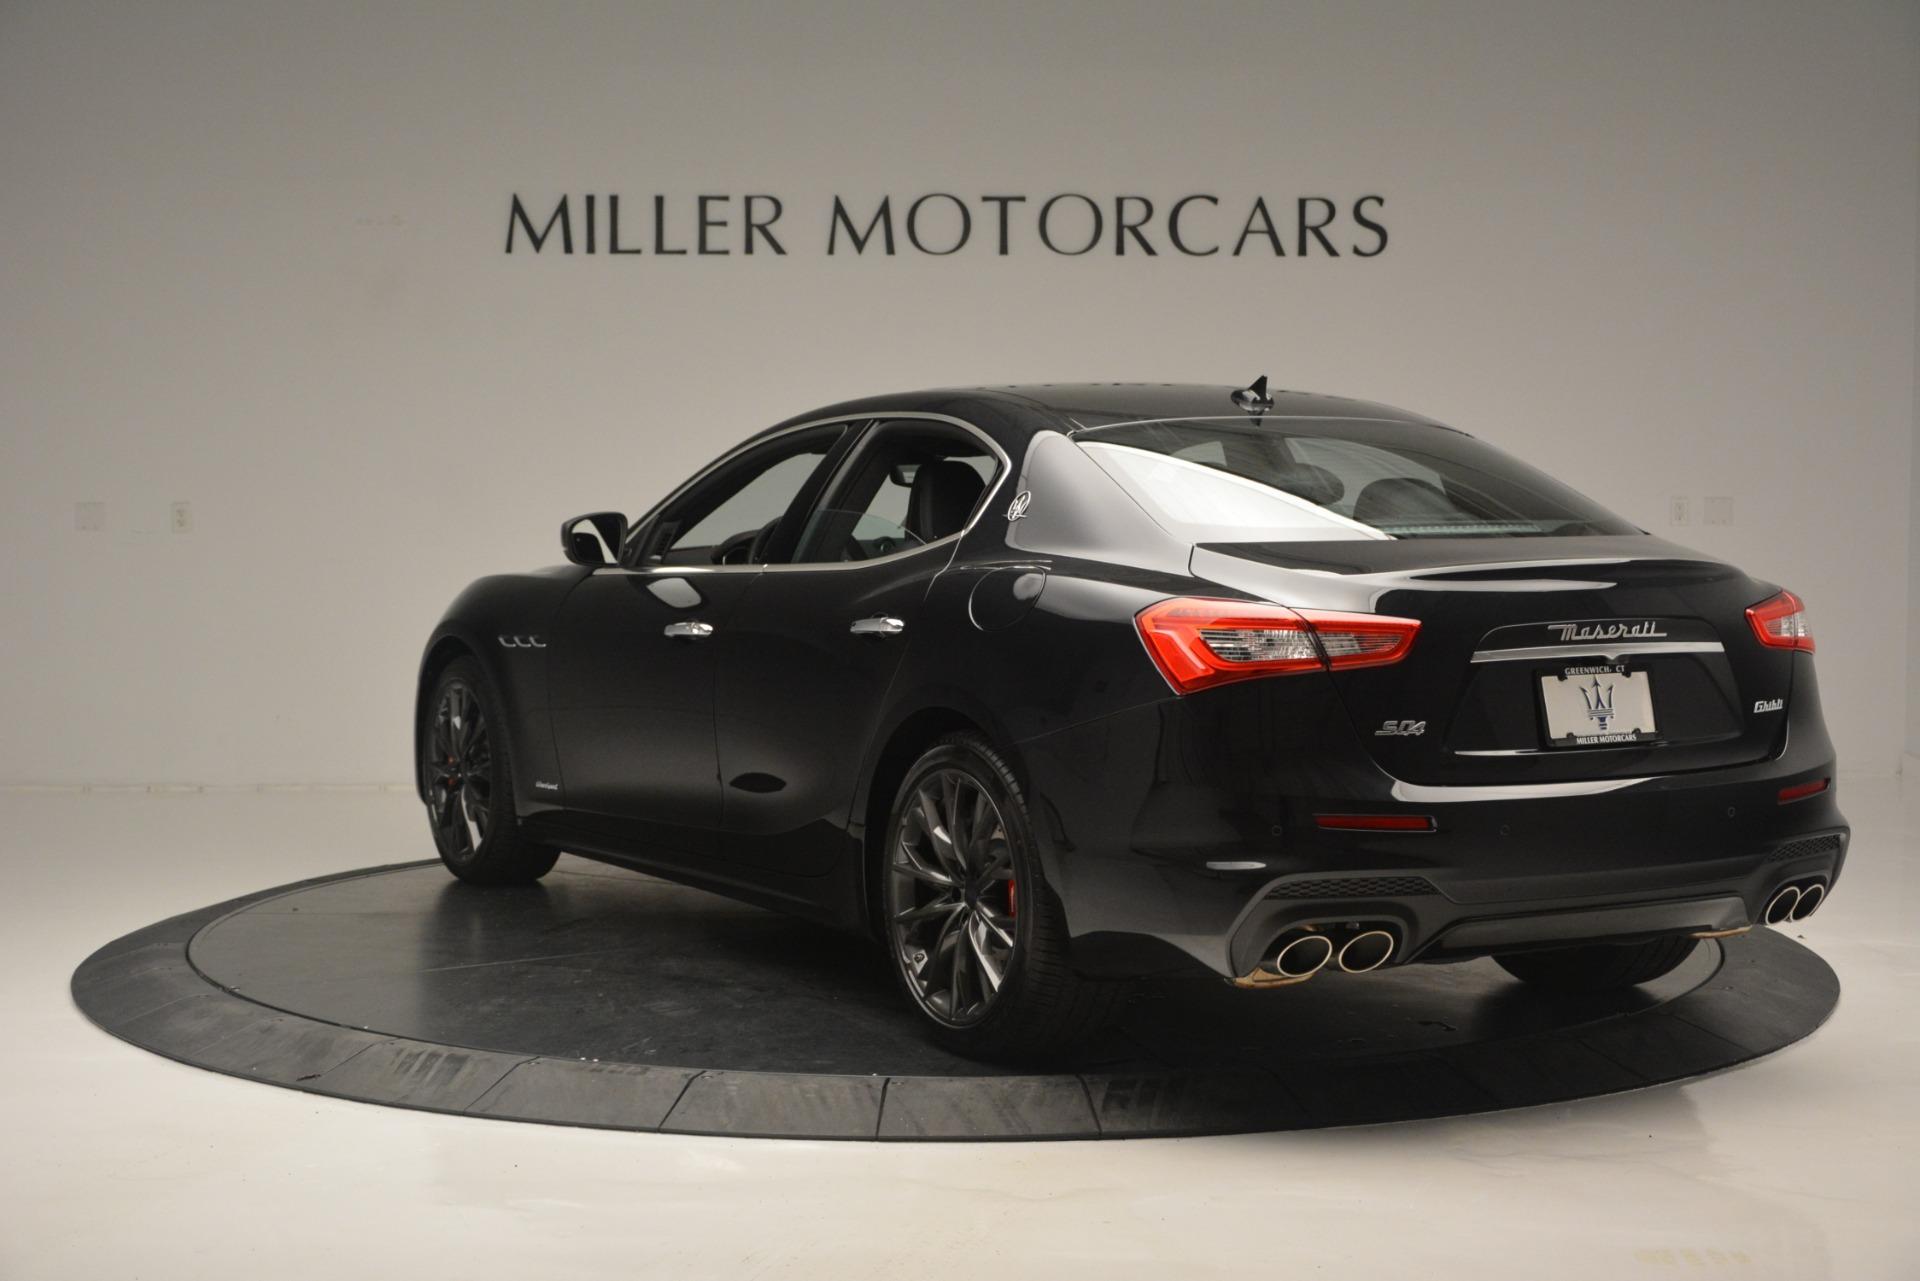 New 2019 Maserati Ghibli S Q4 GranSport For Sale In Greenwich, CT. Alfa Romeo of Greenwich, M2219 2765_p5